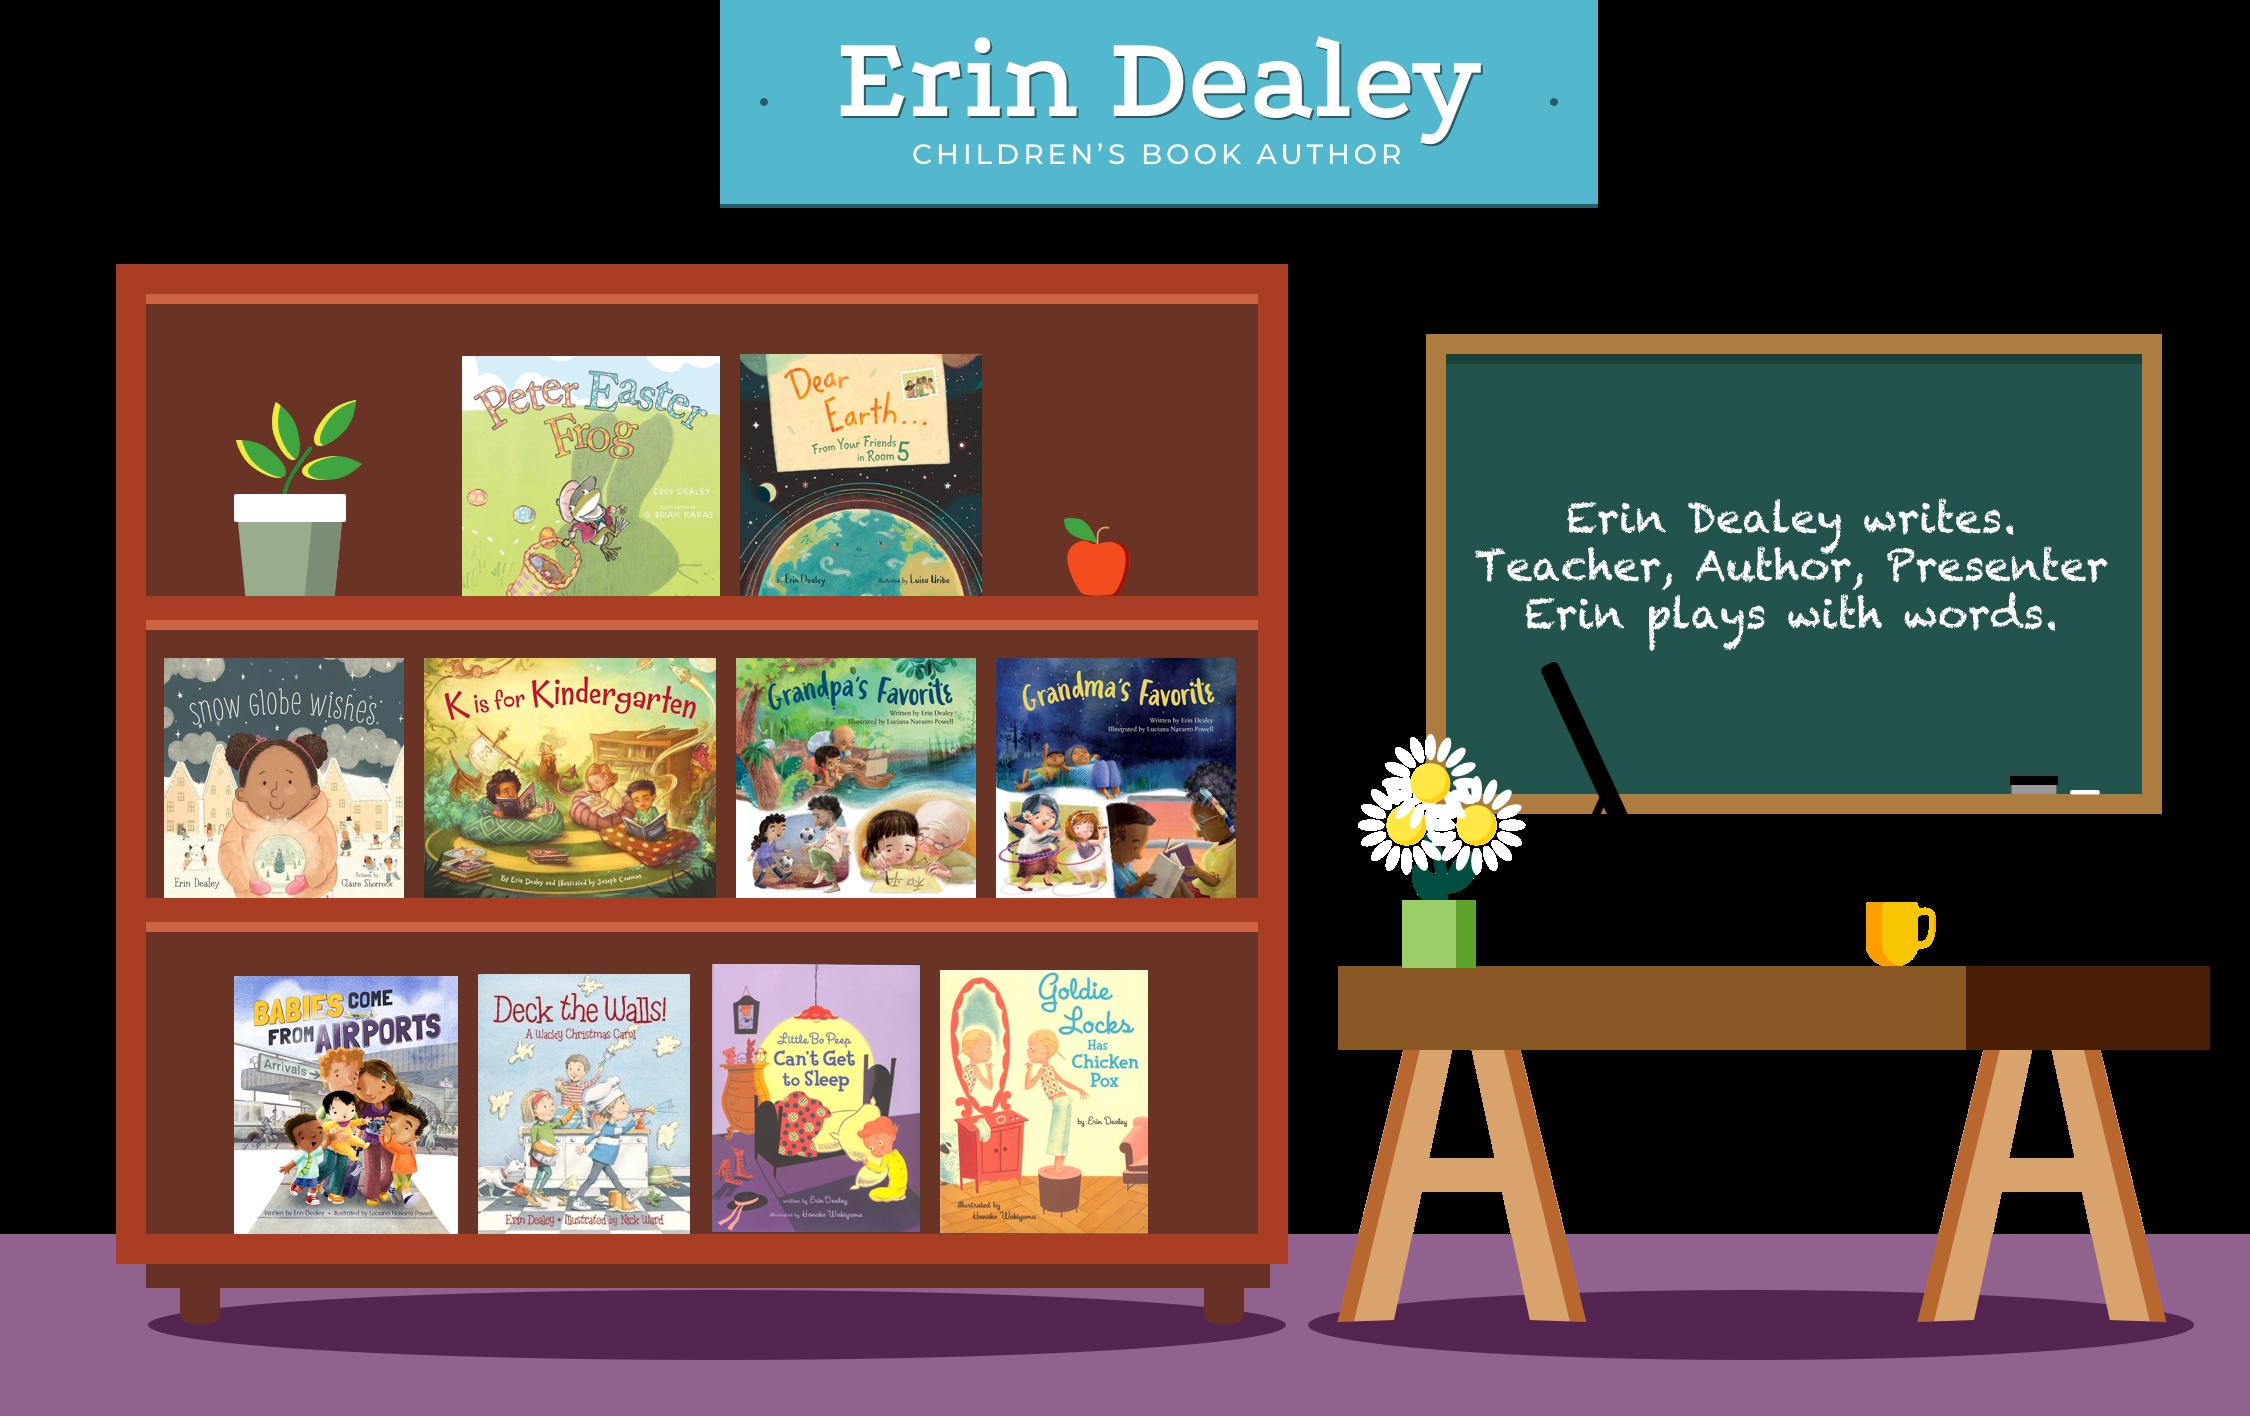 Erin Dealey